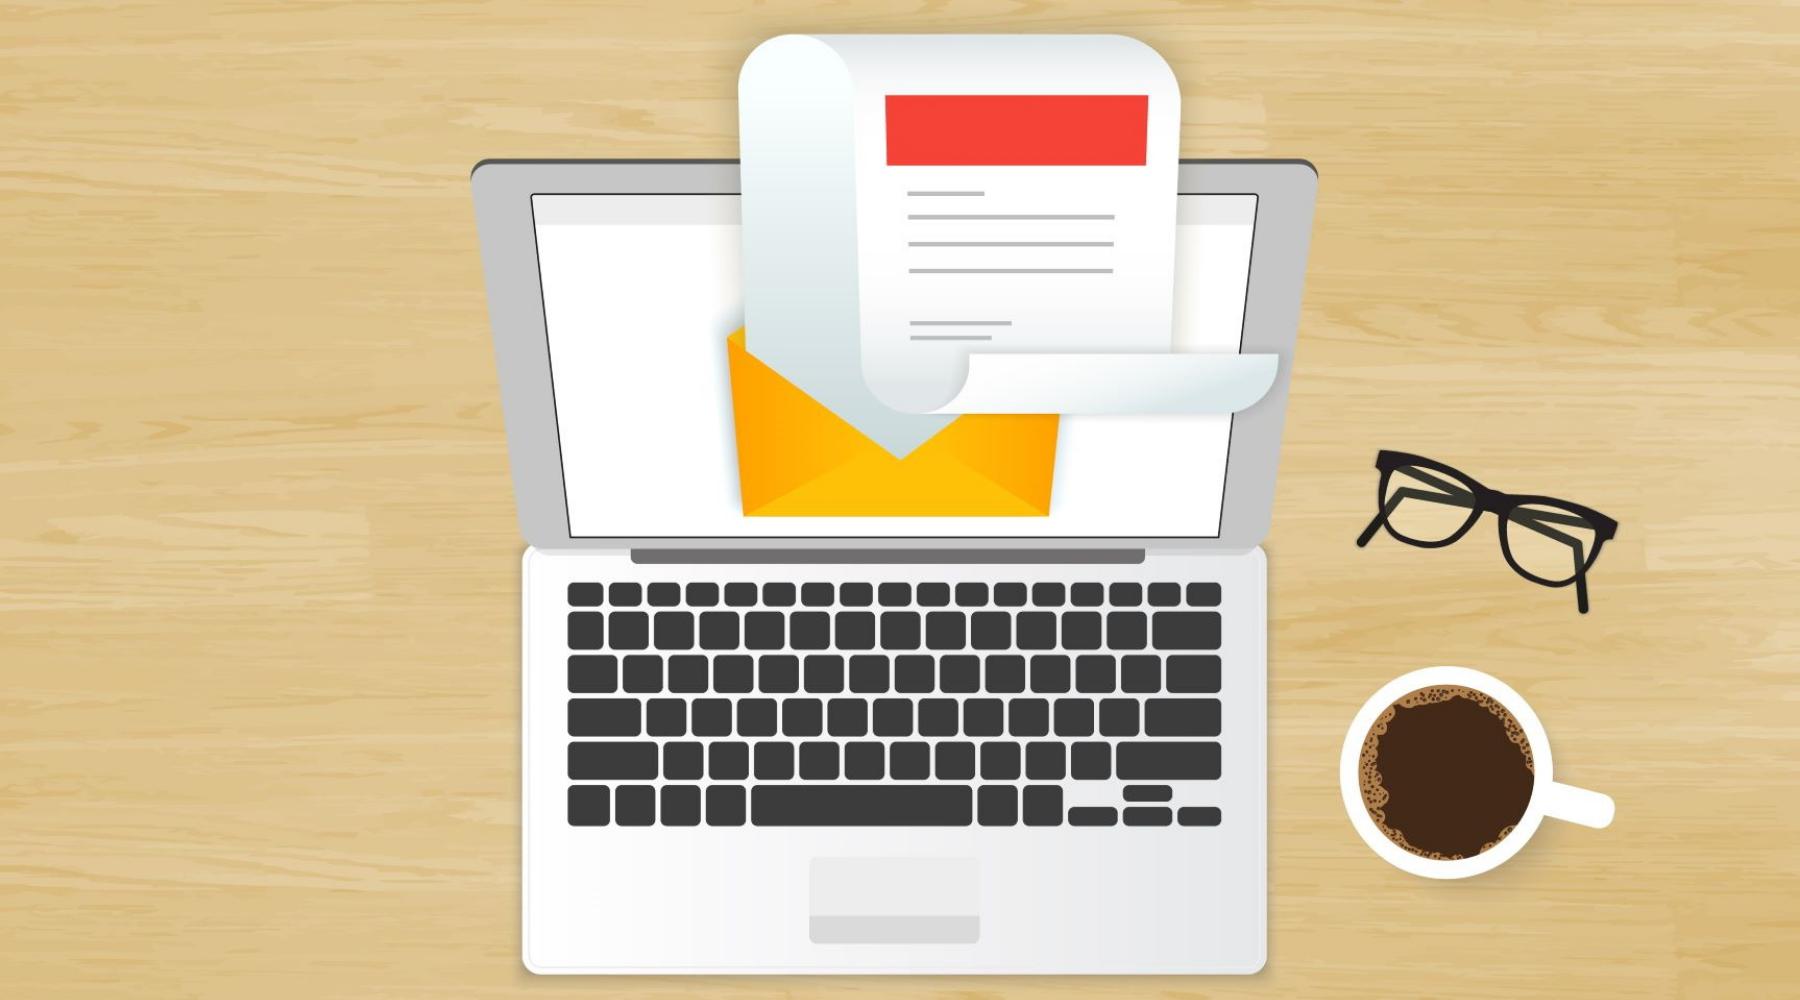 Regular Email Newsletters vs FeedBurner Emails